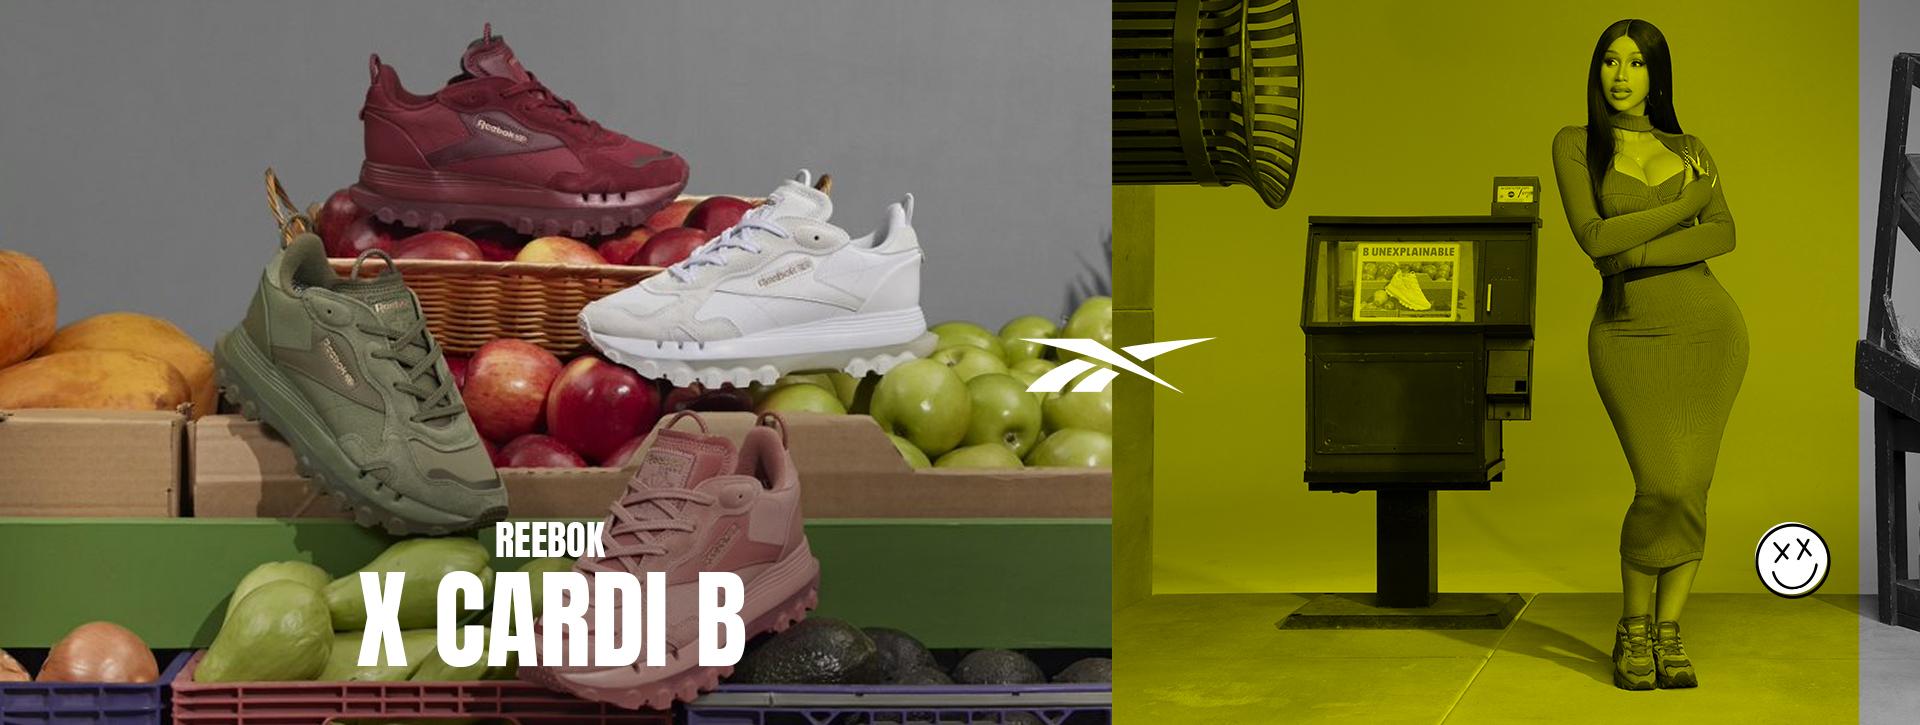 Reebok x Cardi B Collection